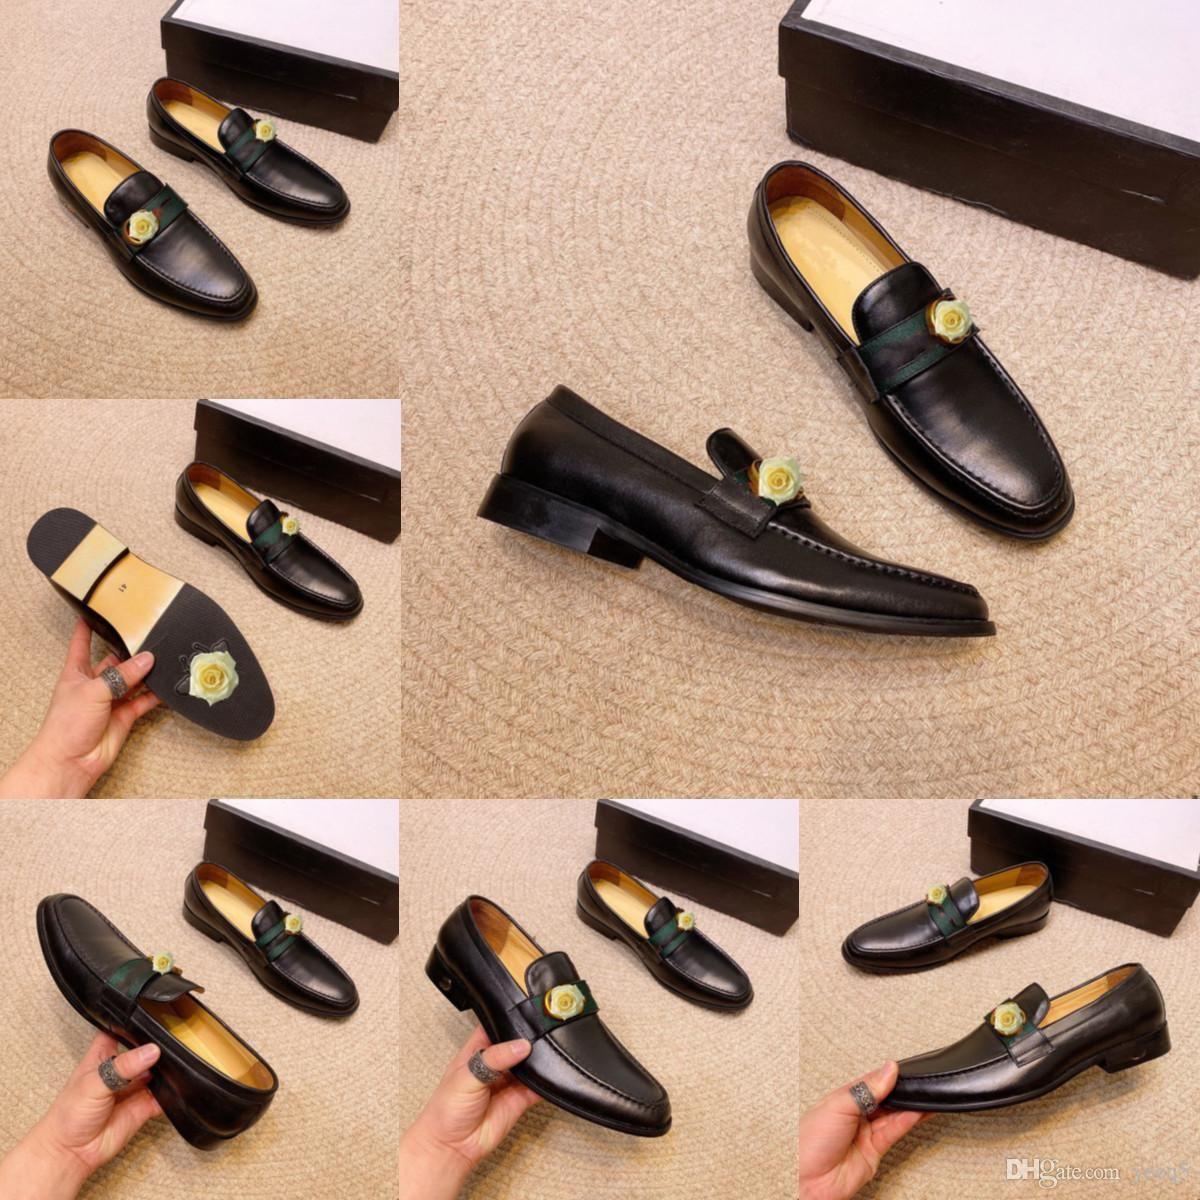 Uomo Casual Shoot Fashion Luxury Solid Oxford Shoes Slip Outdoor Slip On Outdoor Slip on Shoes Shoes Designer Penny Penny Mocassini Maschile Scarpe Brogue